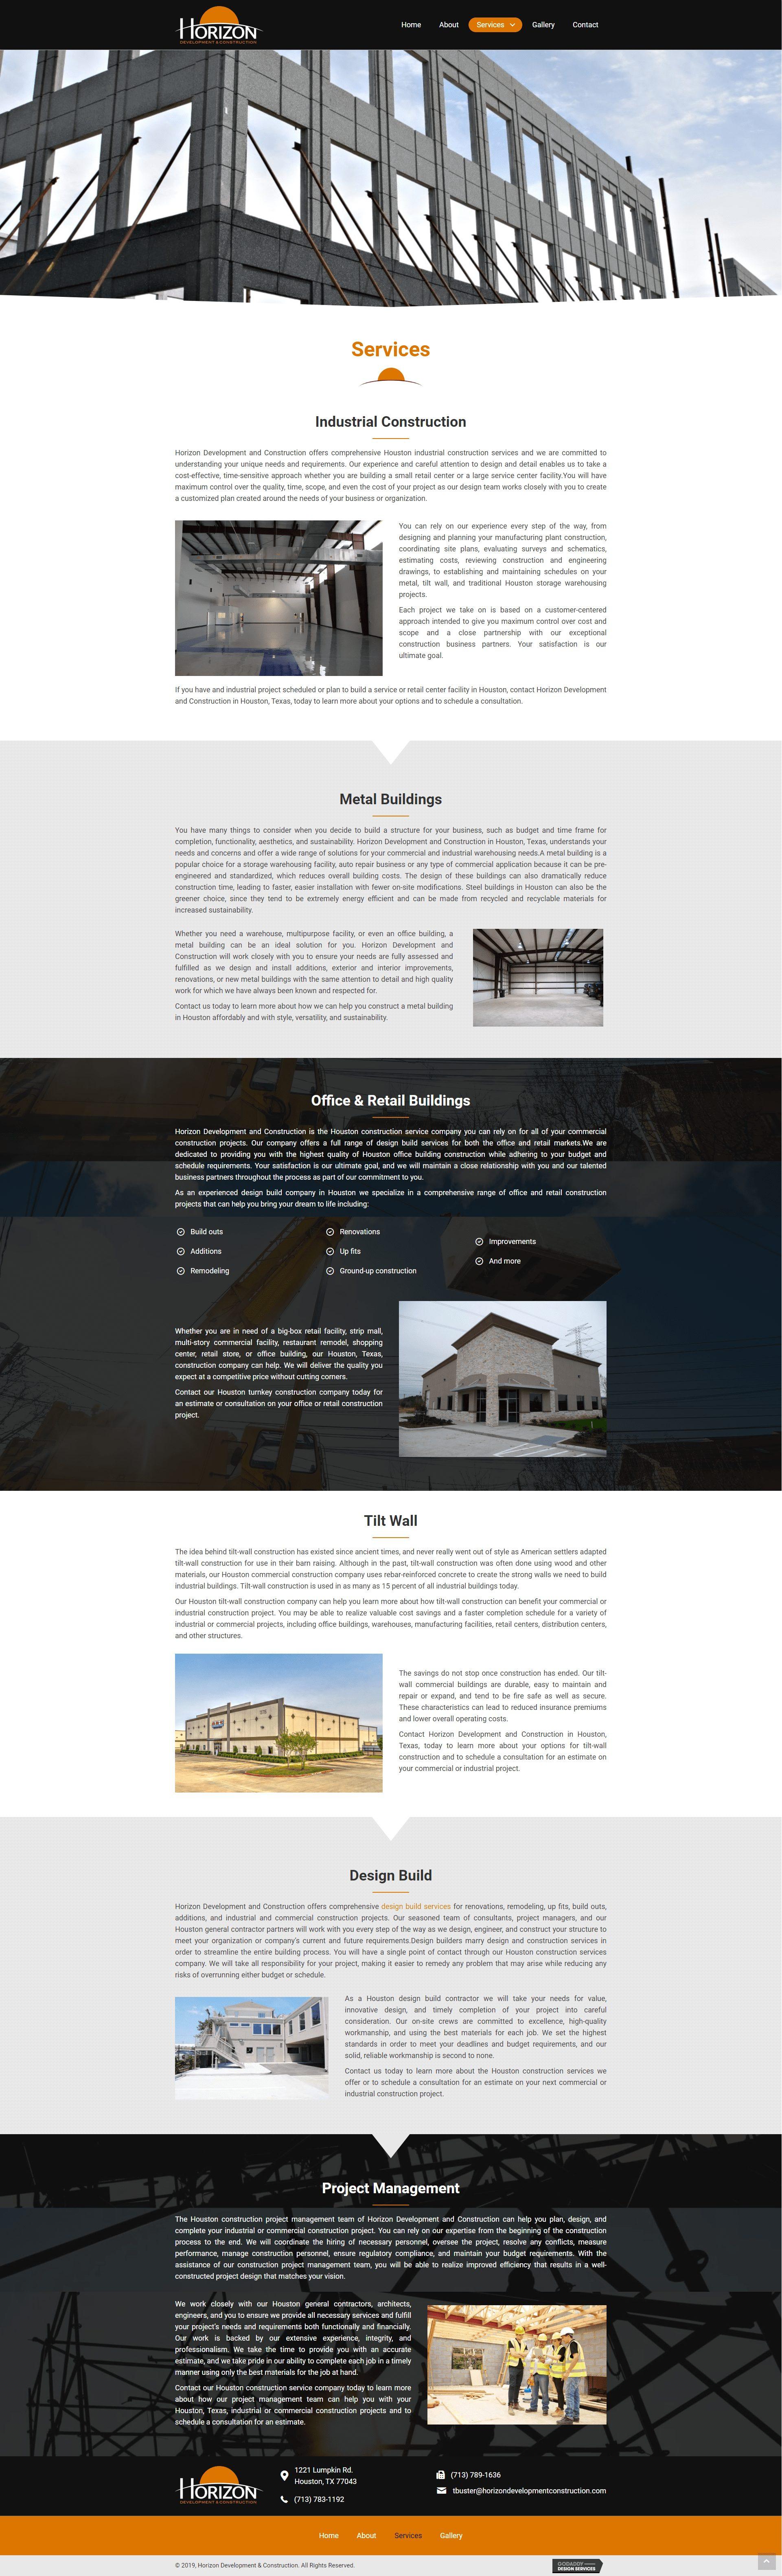 screencapture-houston-general-contractor-services